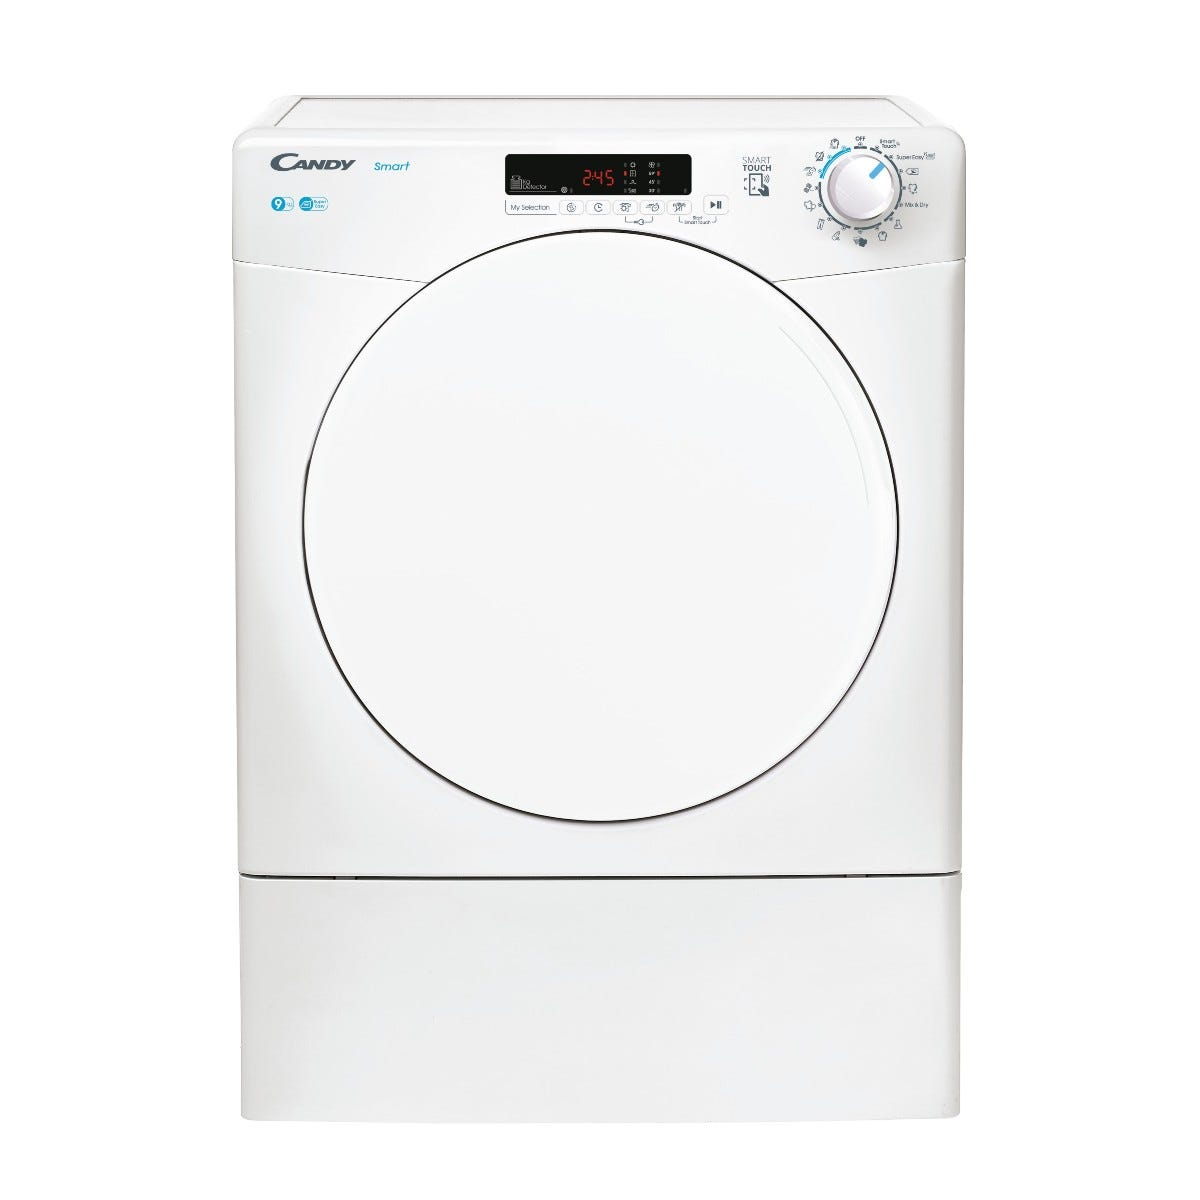 Candy CSE V9DF-80 Smart 9kg Vented Tumble Dryer - White